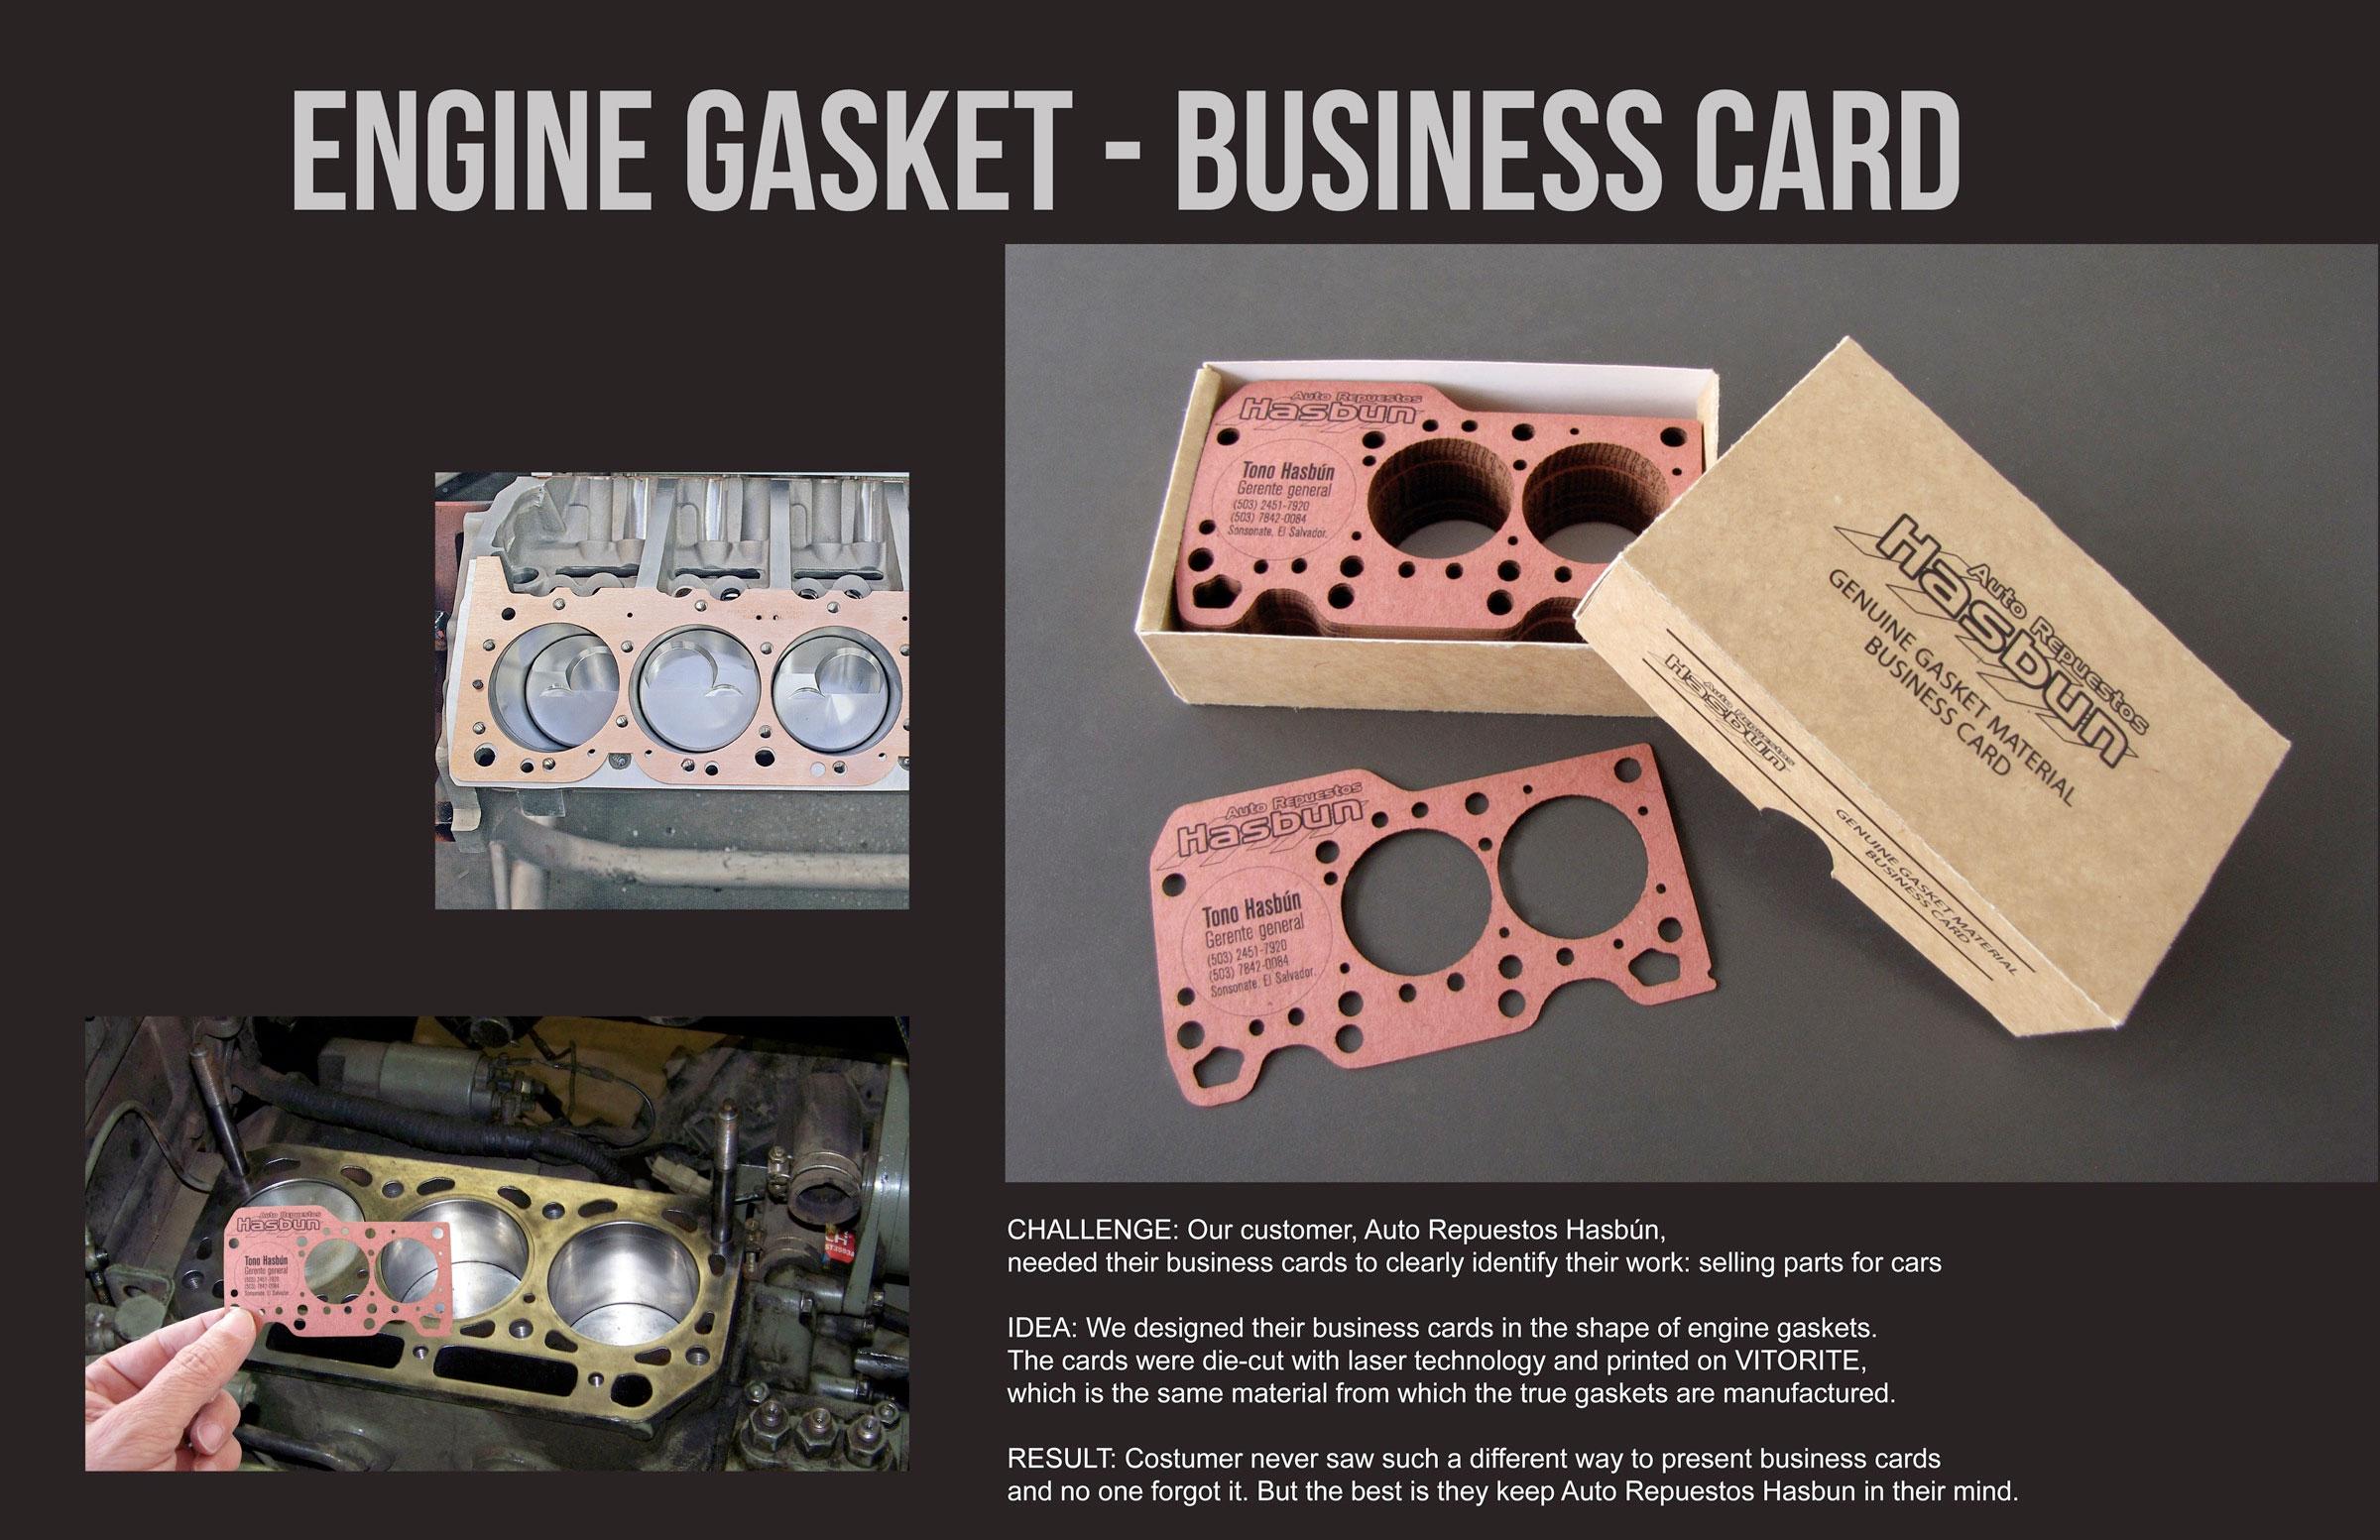 Engine Gasket Business Card